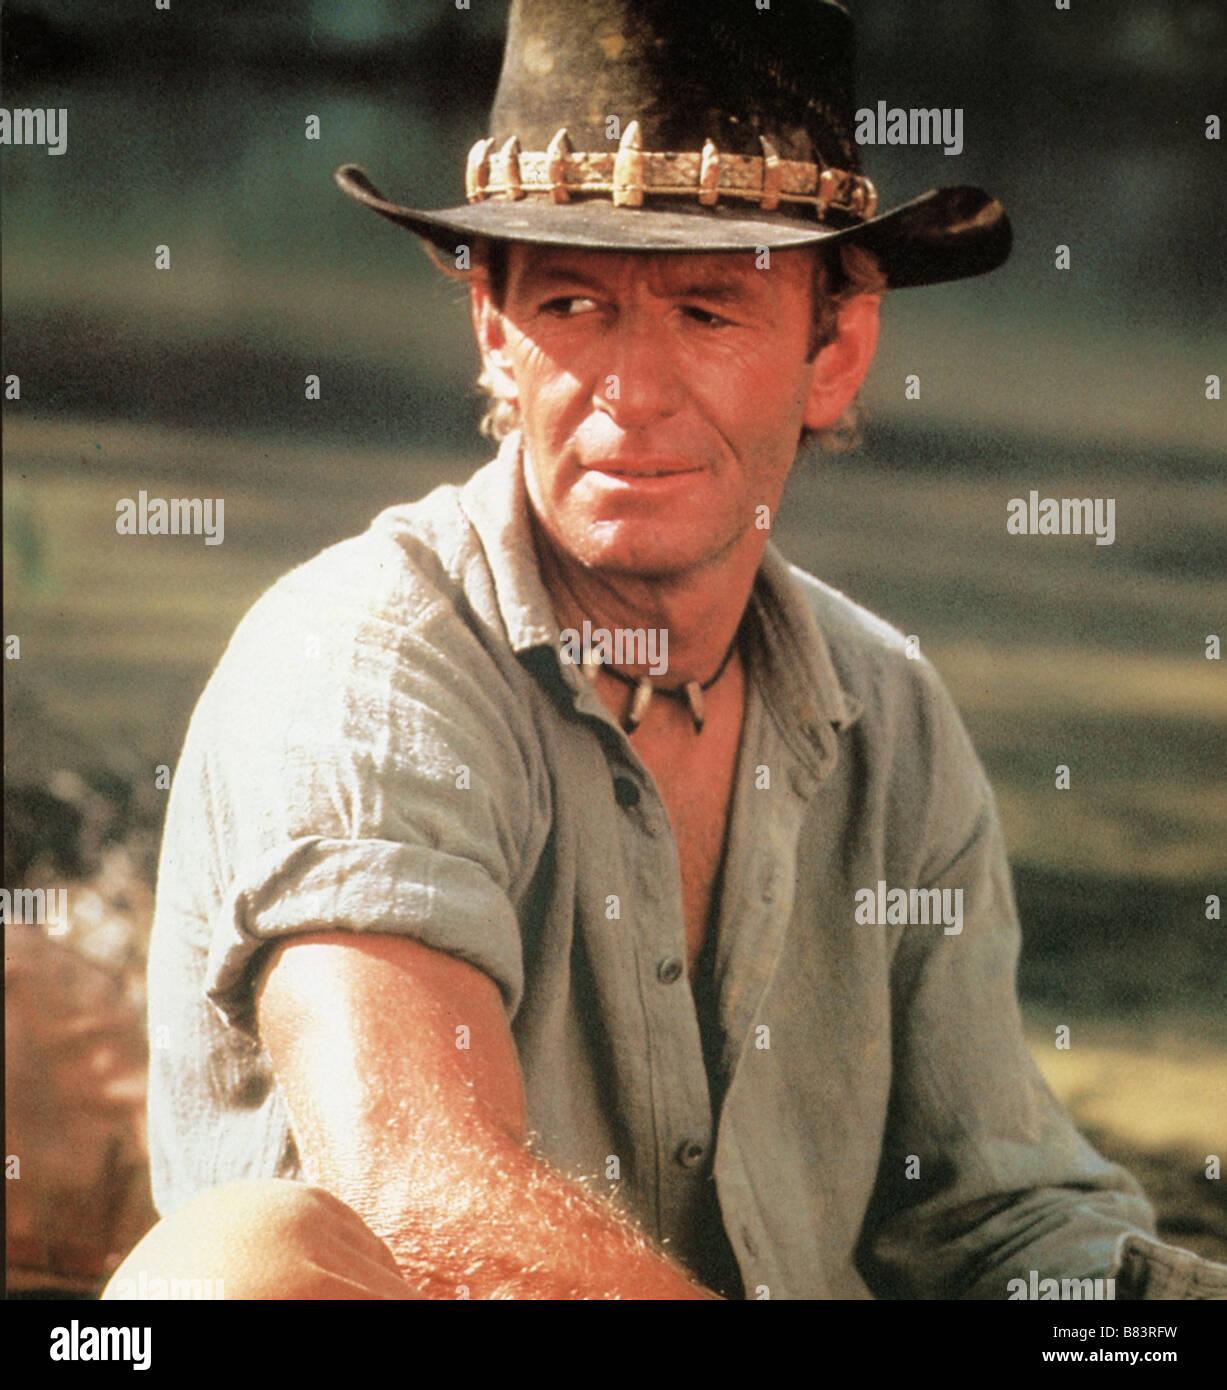 Crocodile Dundee Year  1986 - Australia Director  Peter Faiman Paul Hogan -  Stock Image a5aacd3ce79f